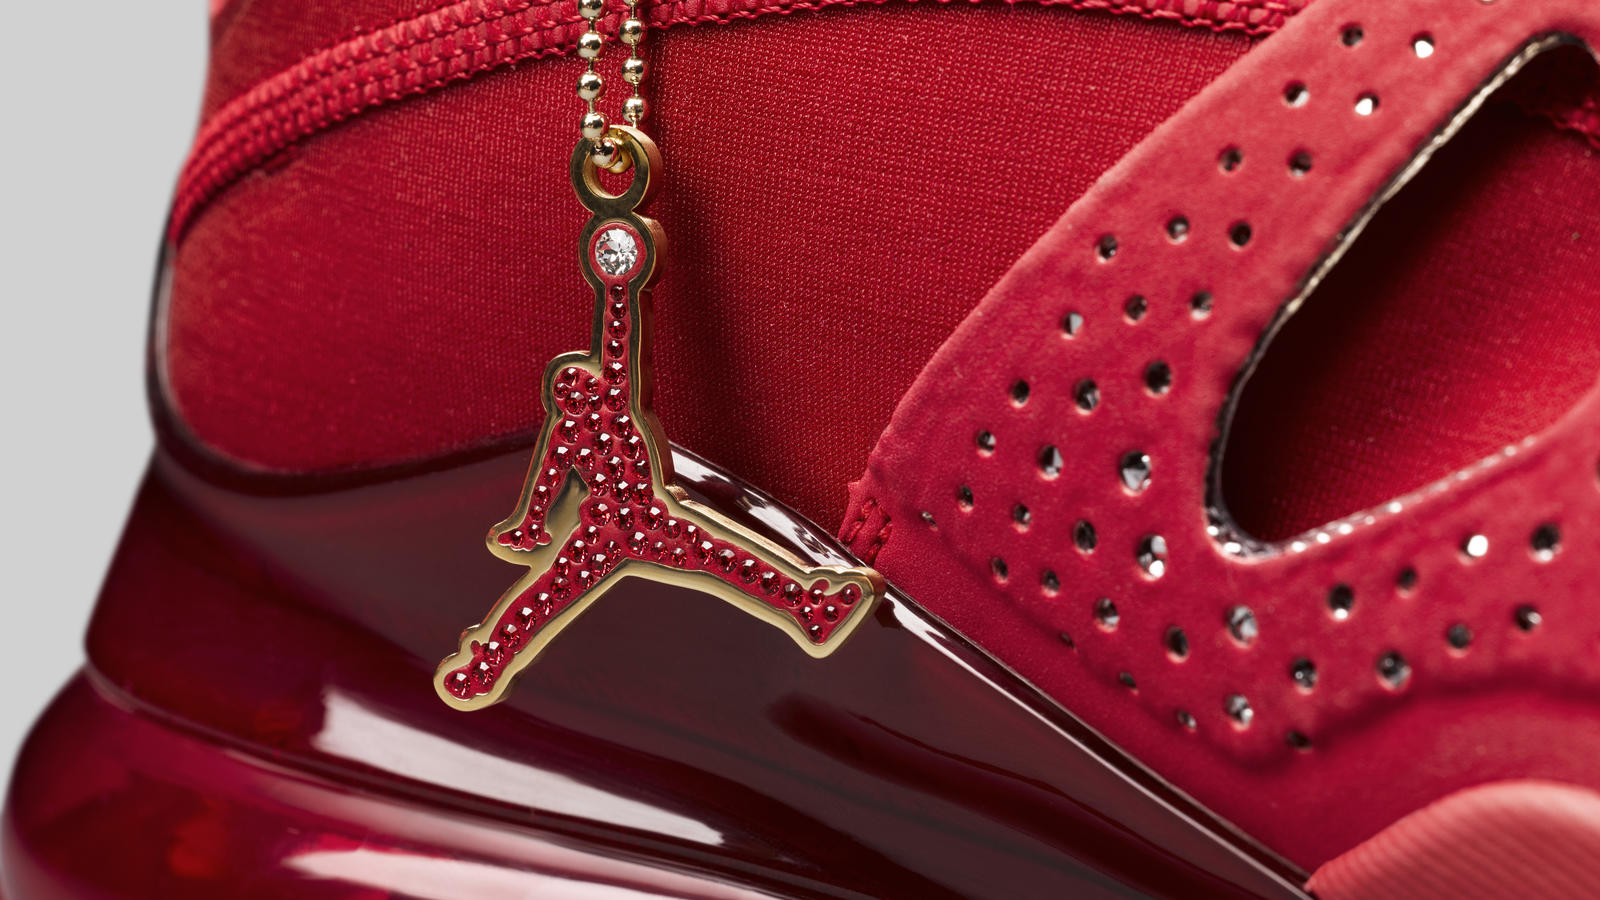 Jordan Air Latitude 720 Swarovski® Official Images and Release Date 6